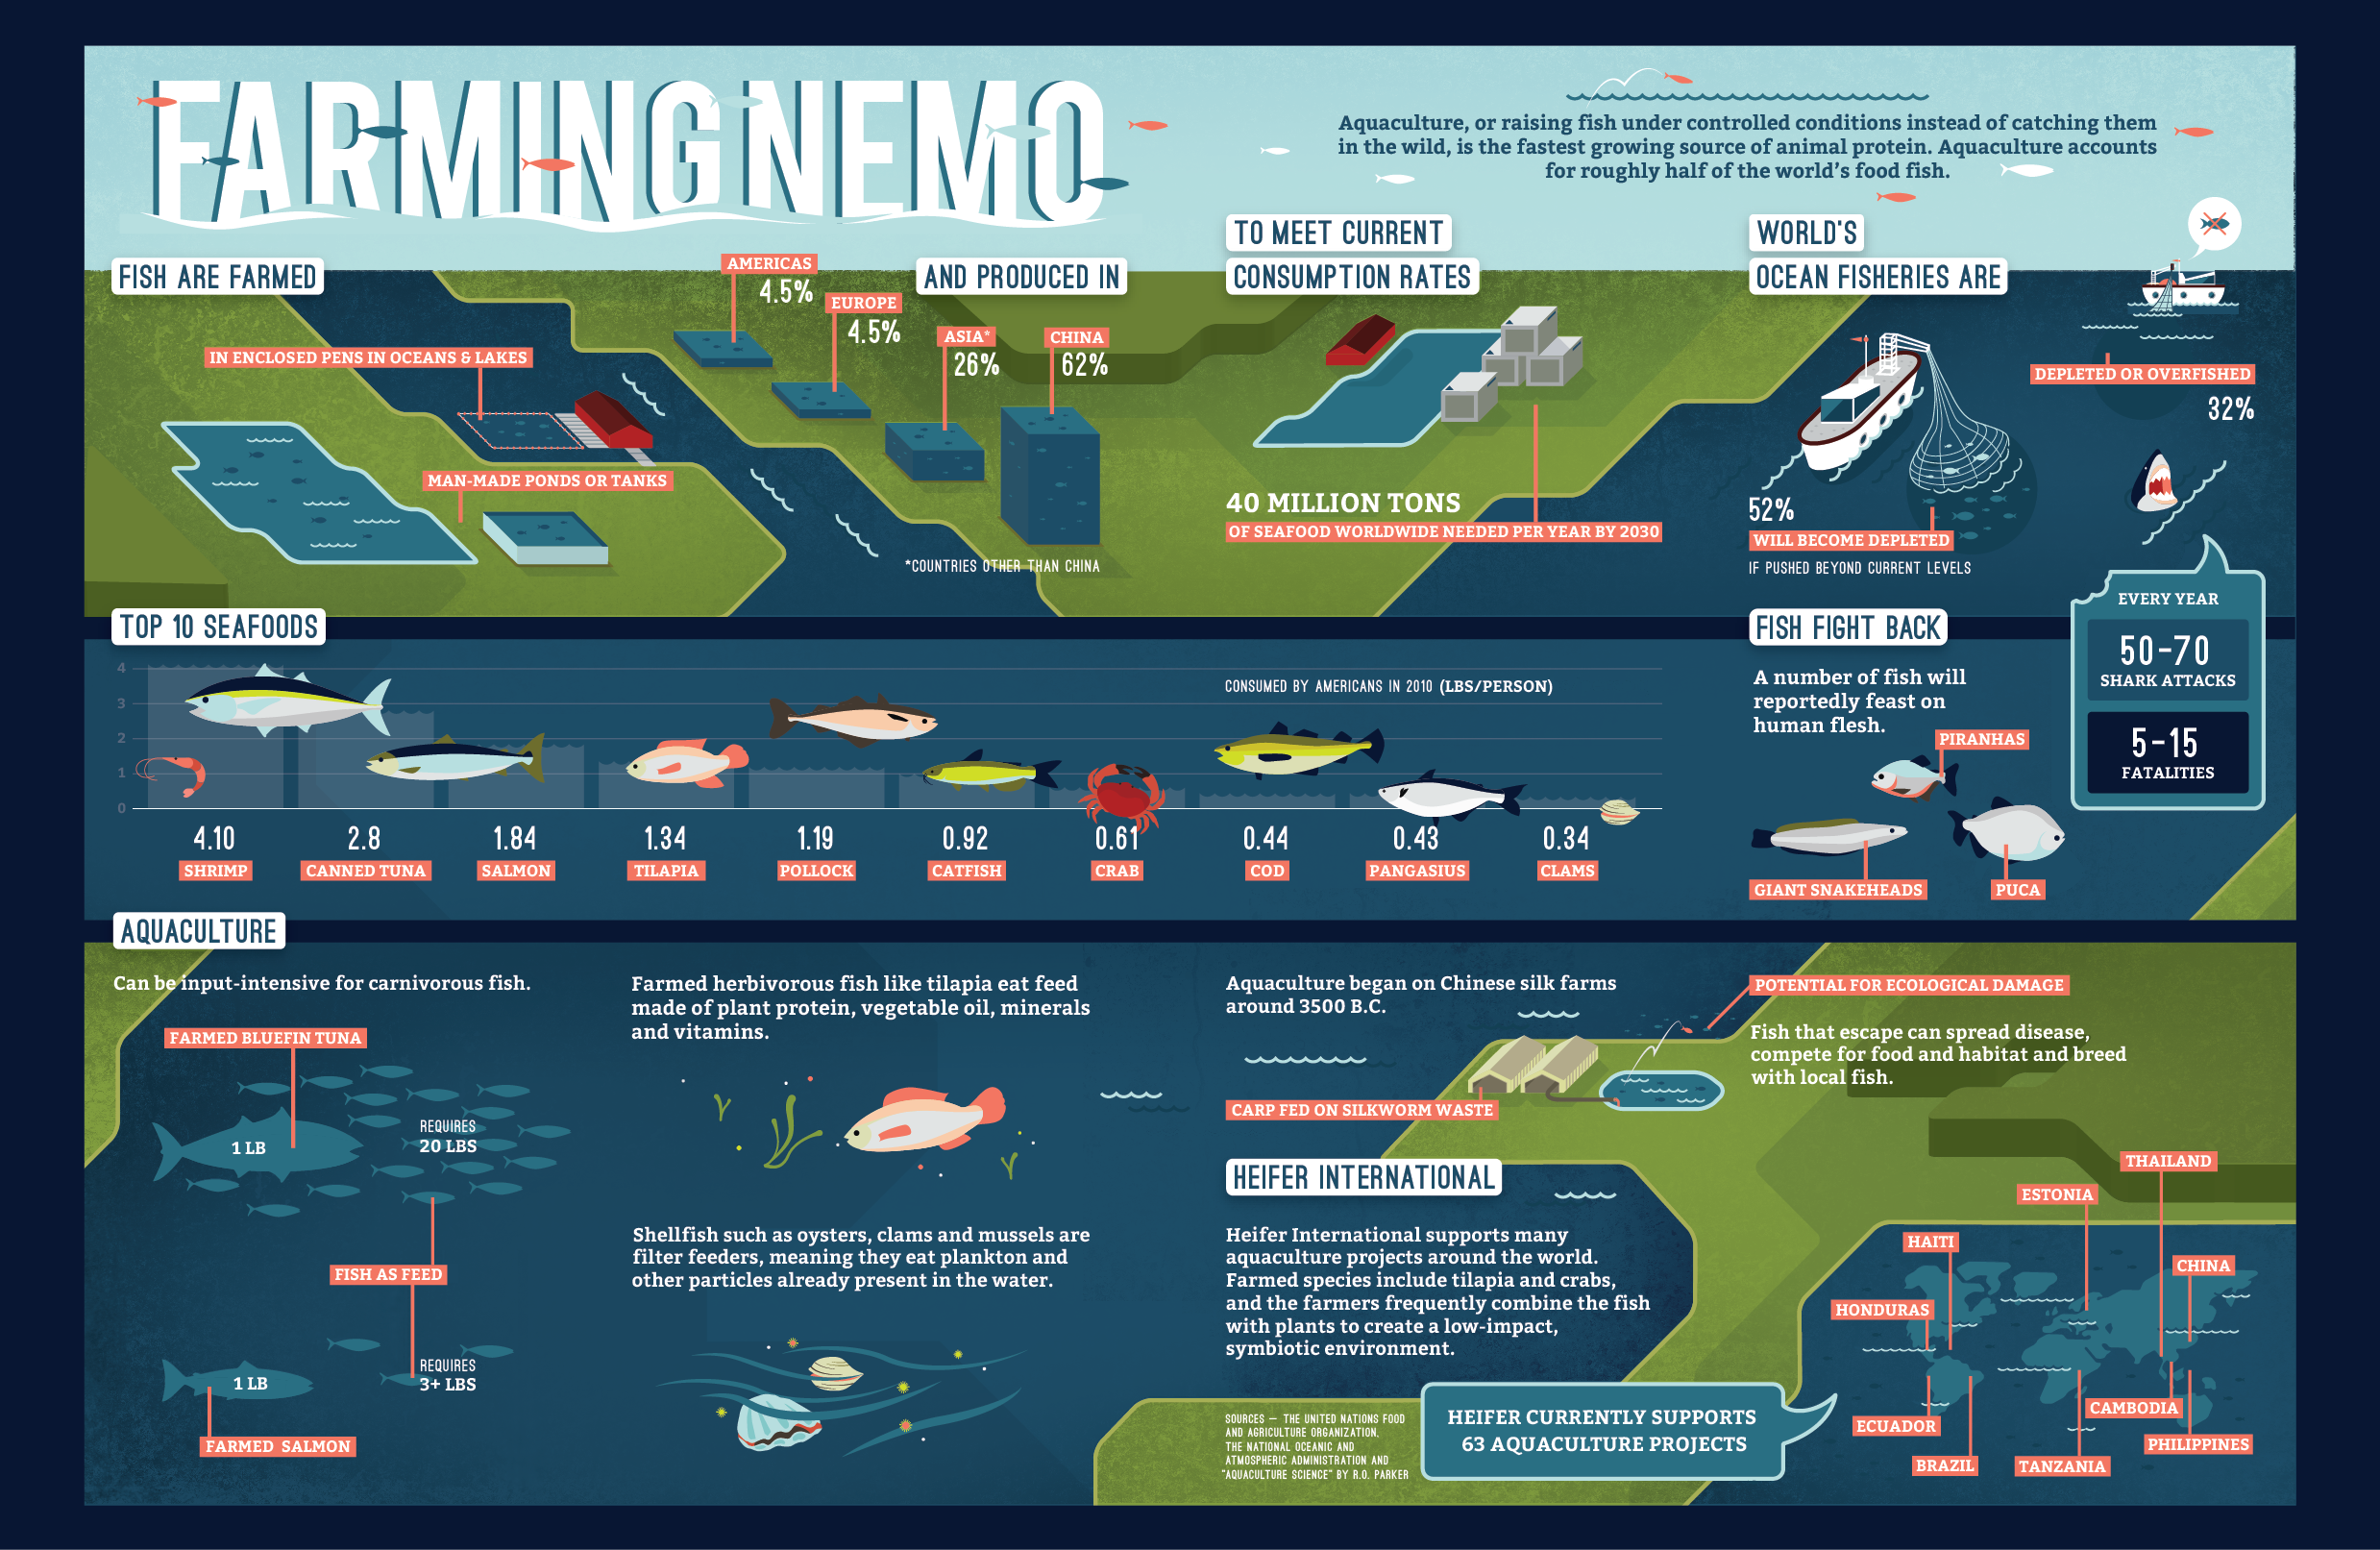 Farming Nemo Infographic